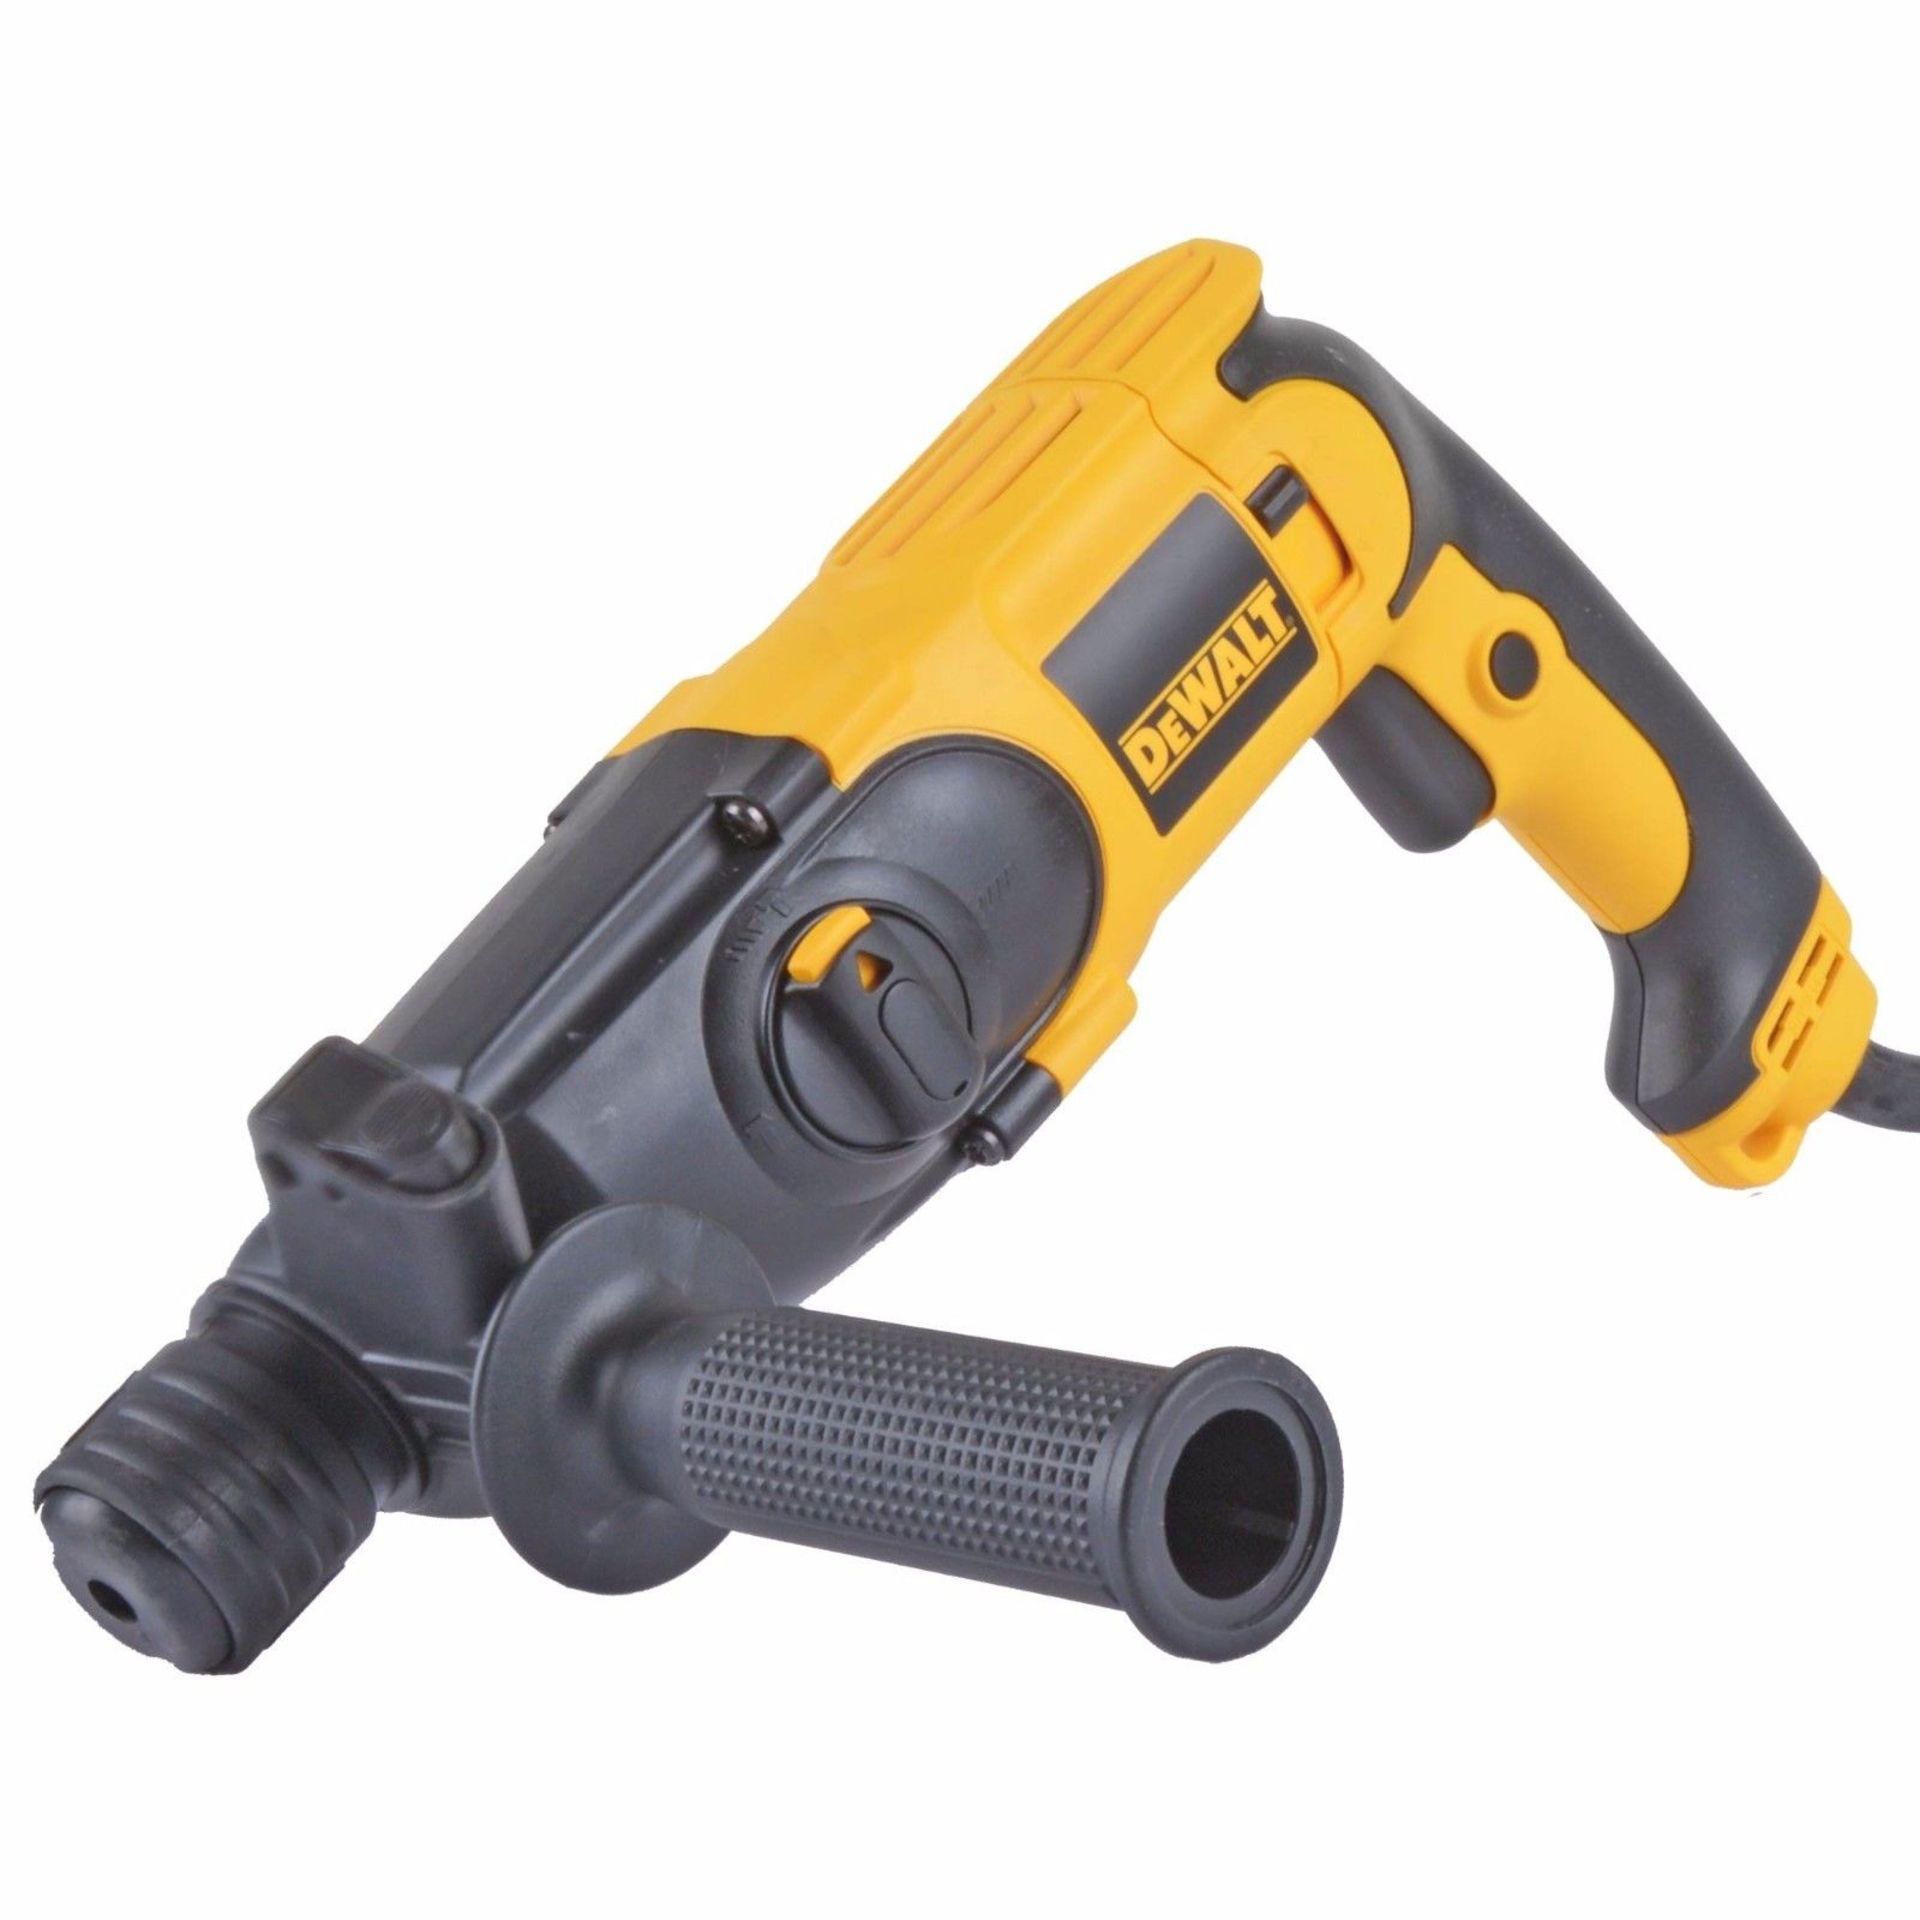 Lot 43012 - V Brand New DeWalt Tradesman SDS+ Hammer Drill (Chiselling Action) 110v ISP 108.95 (Amazon)